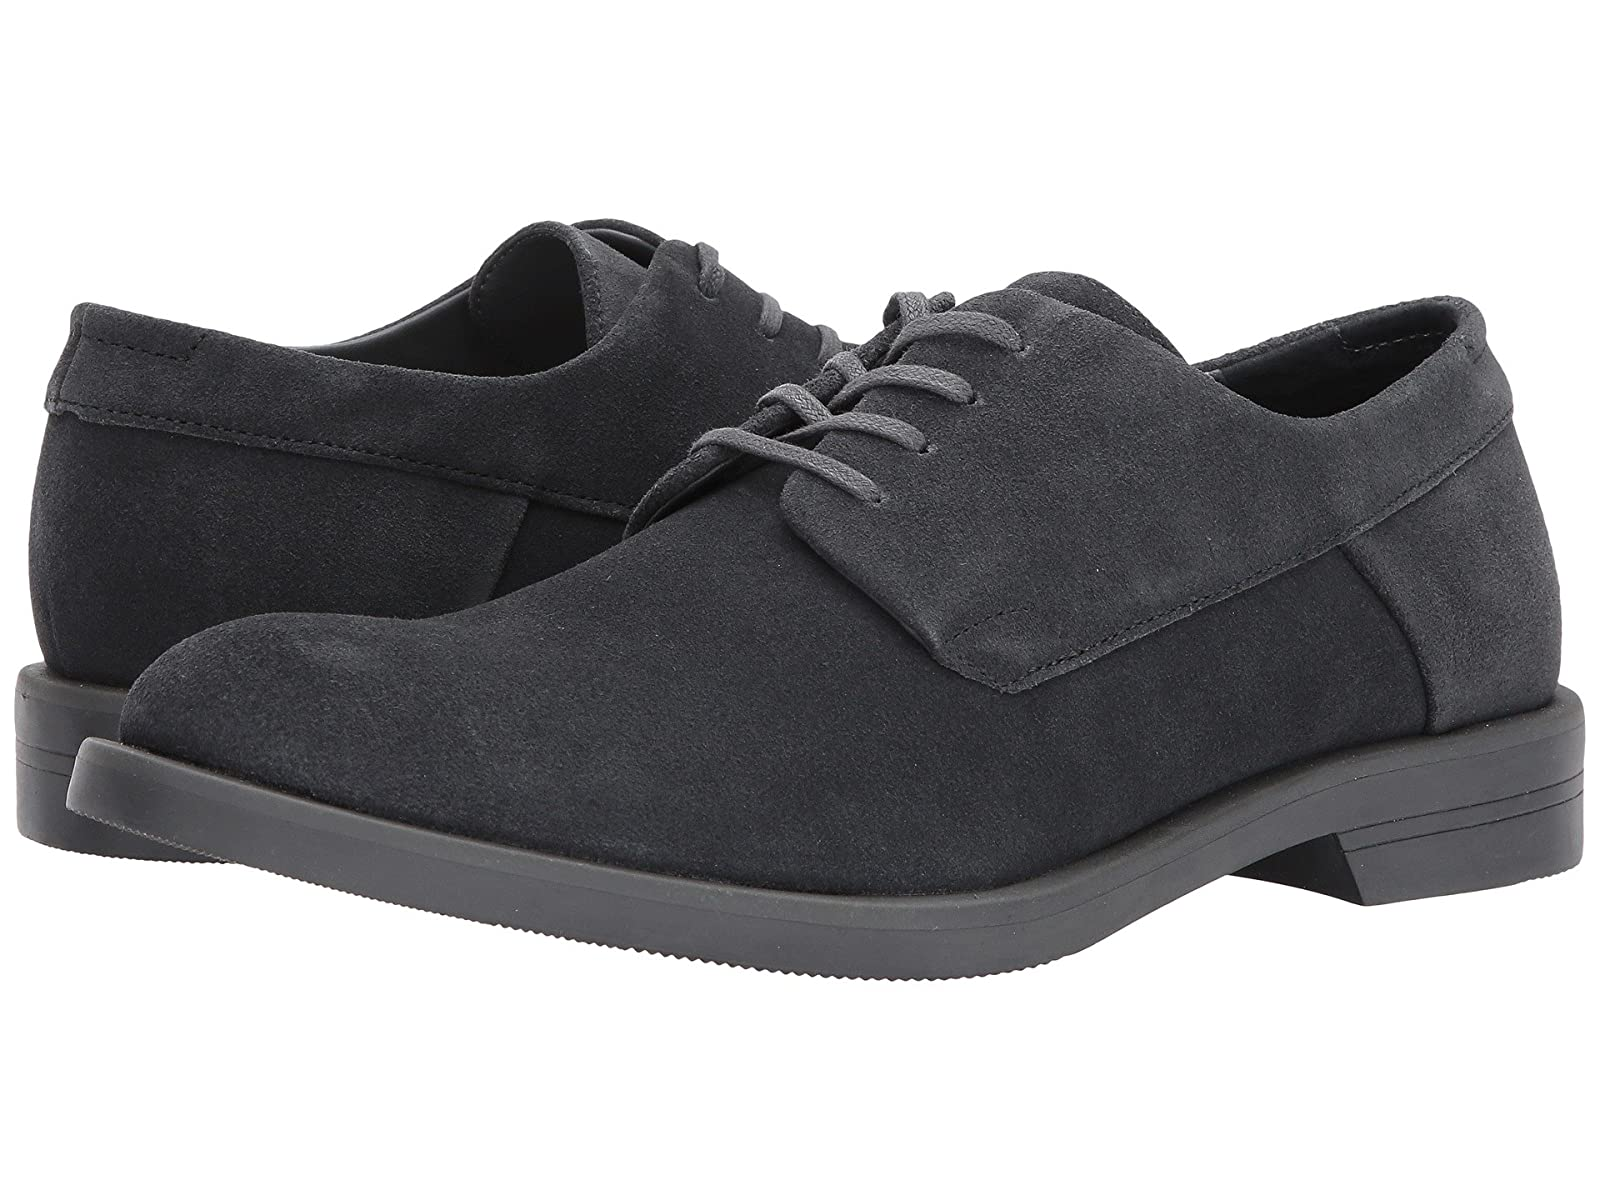 Calvin Klein YoseffCheap and distinctive eye-catching shoes